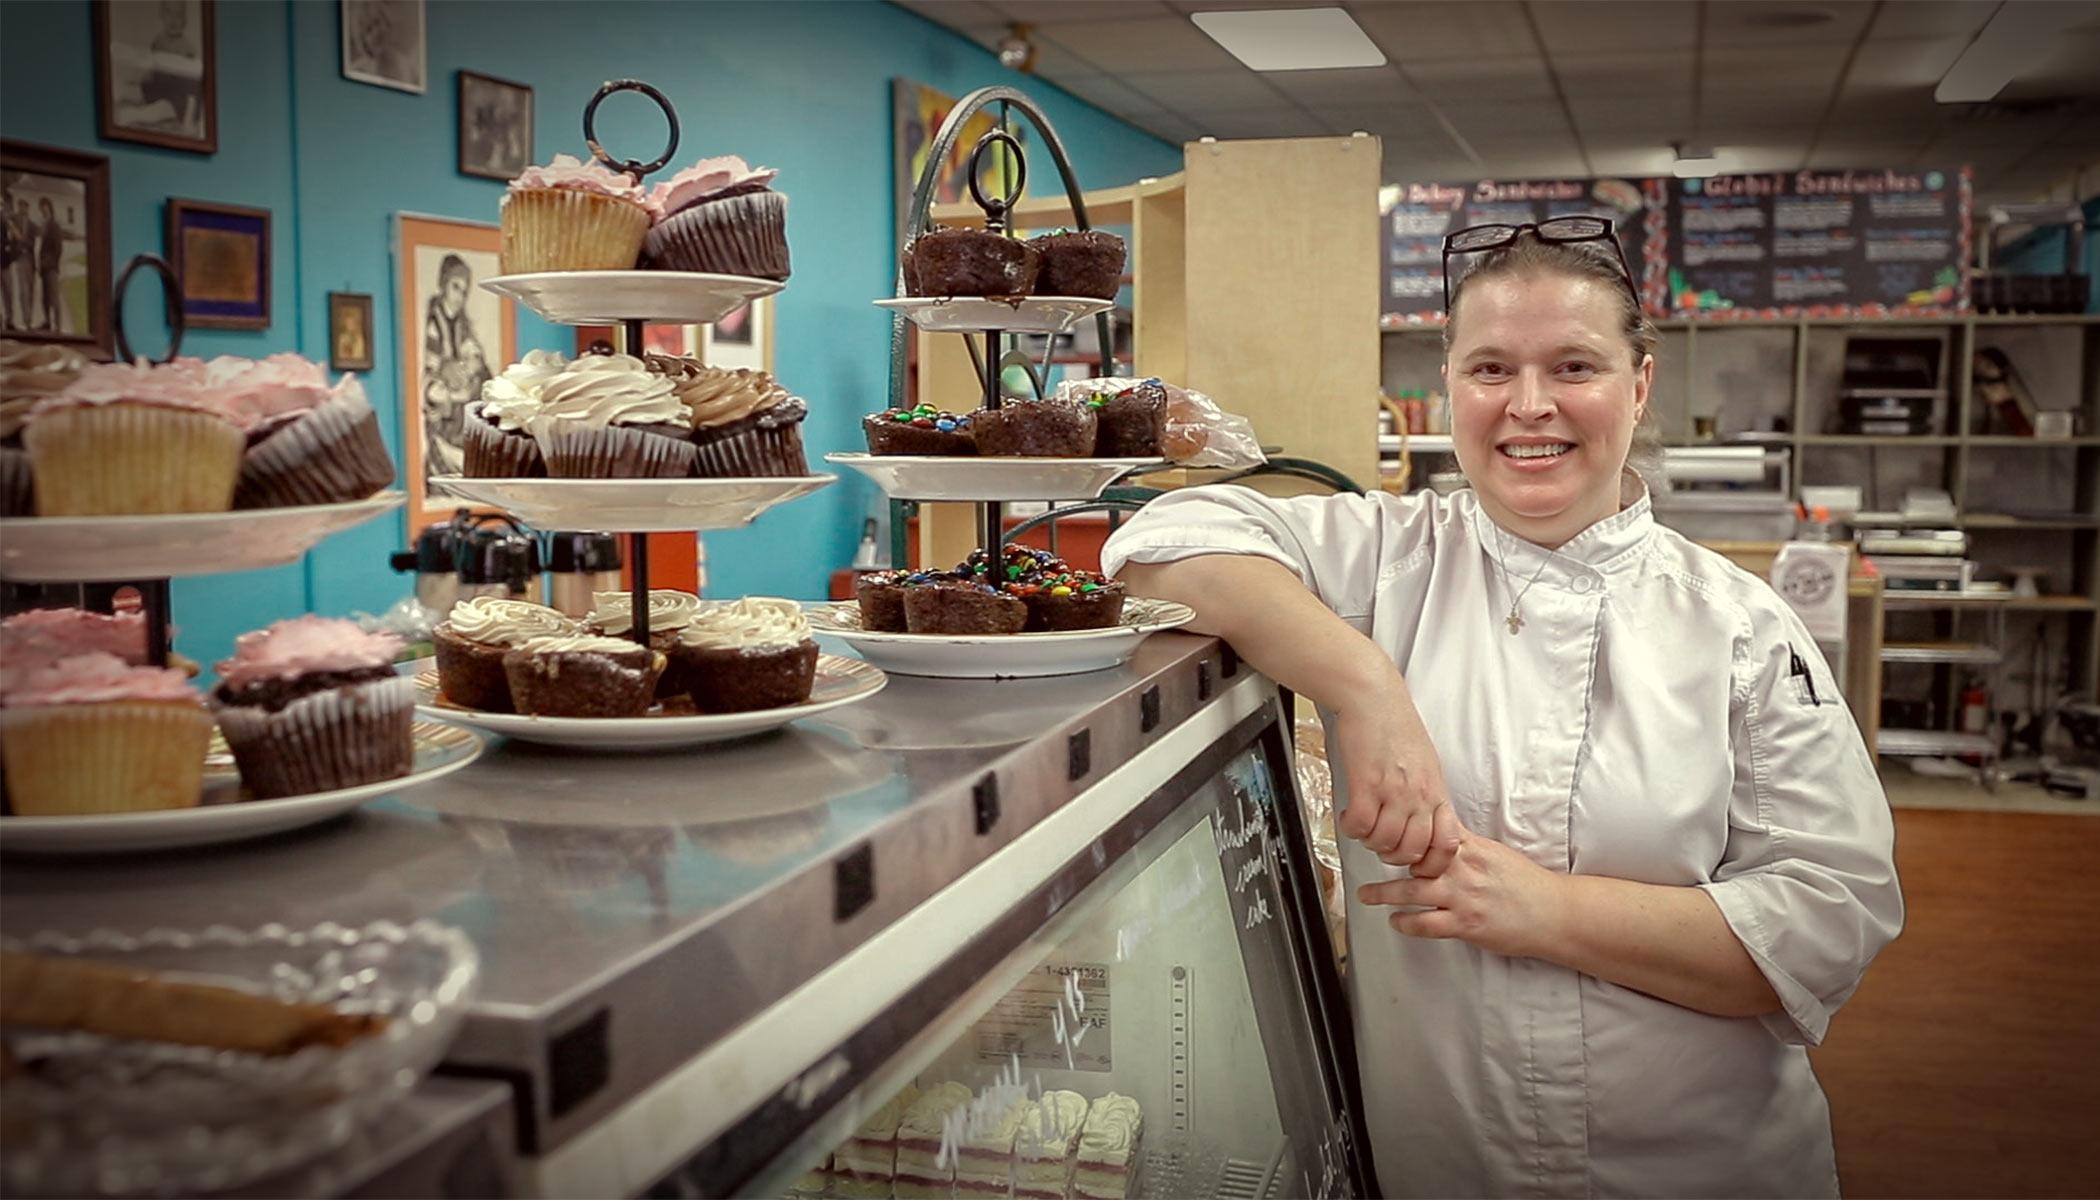 Life-svmc-bakery-lady